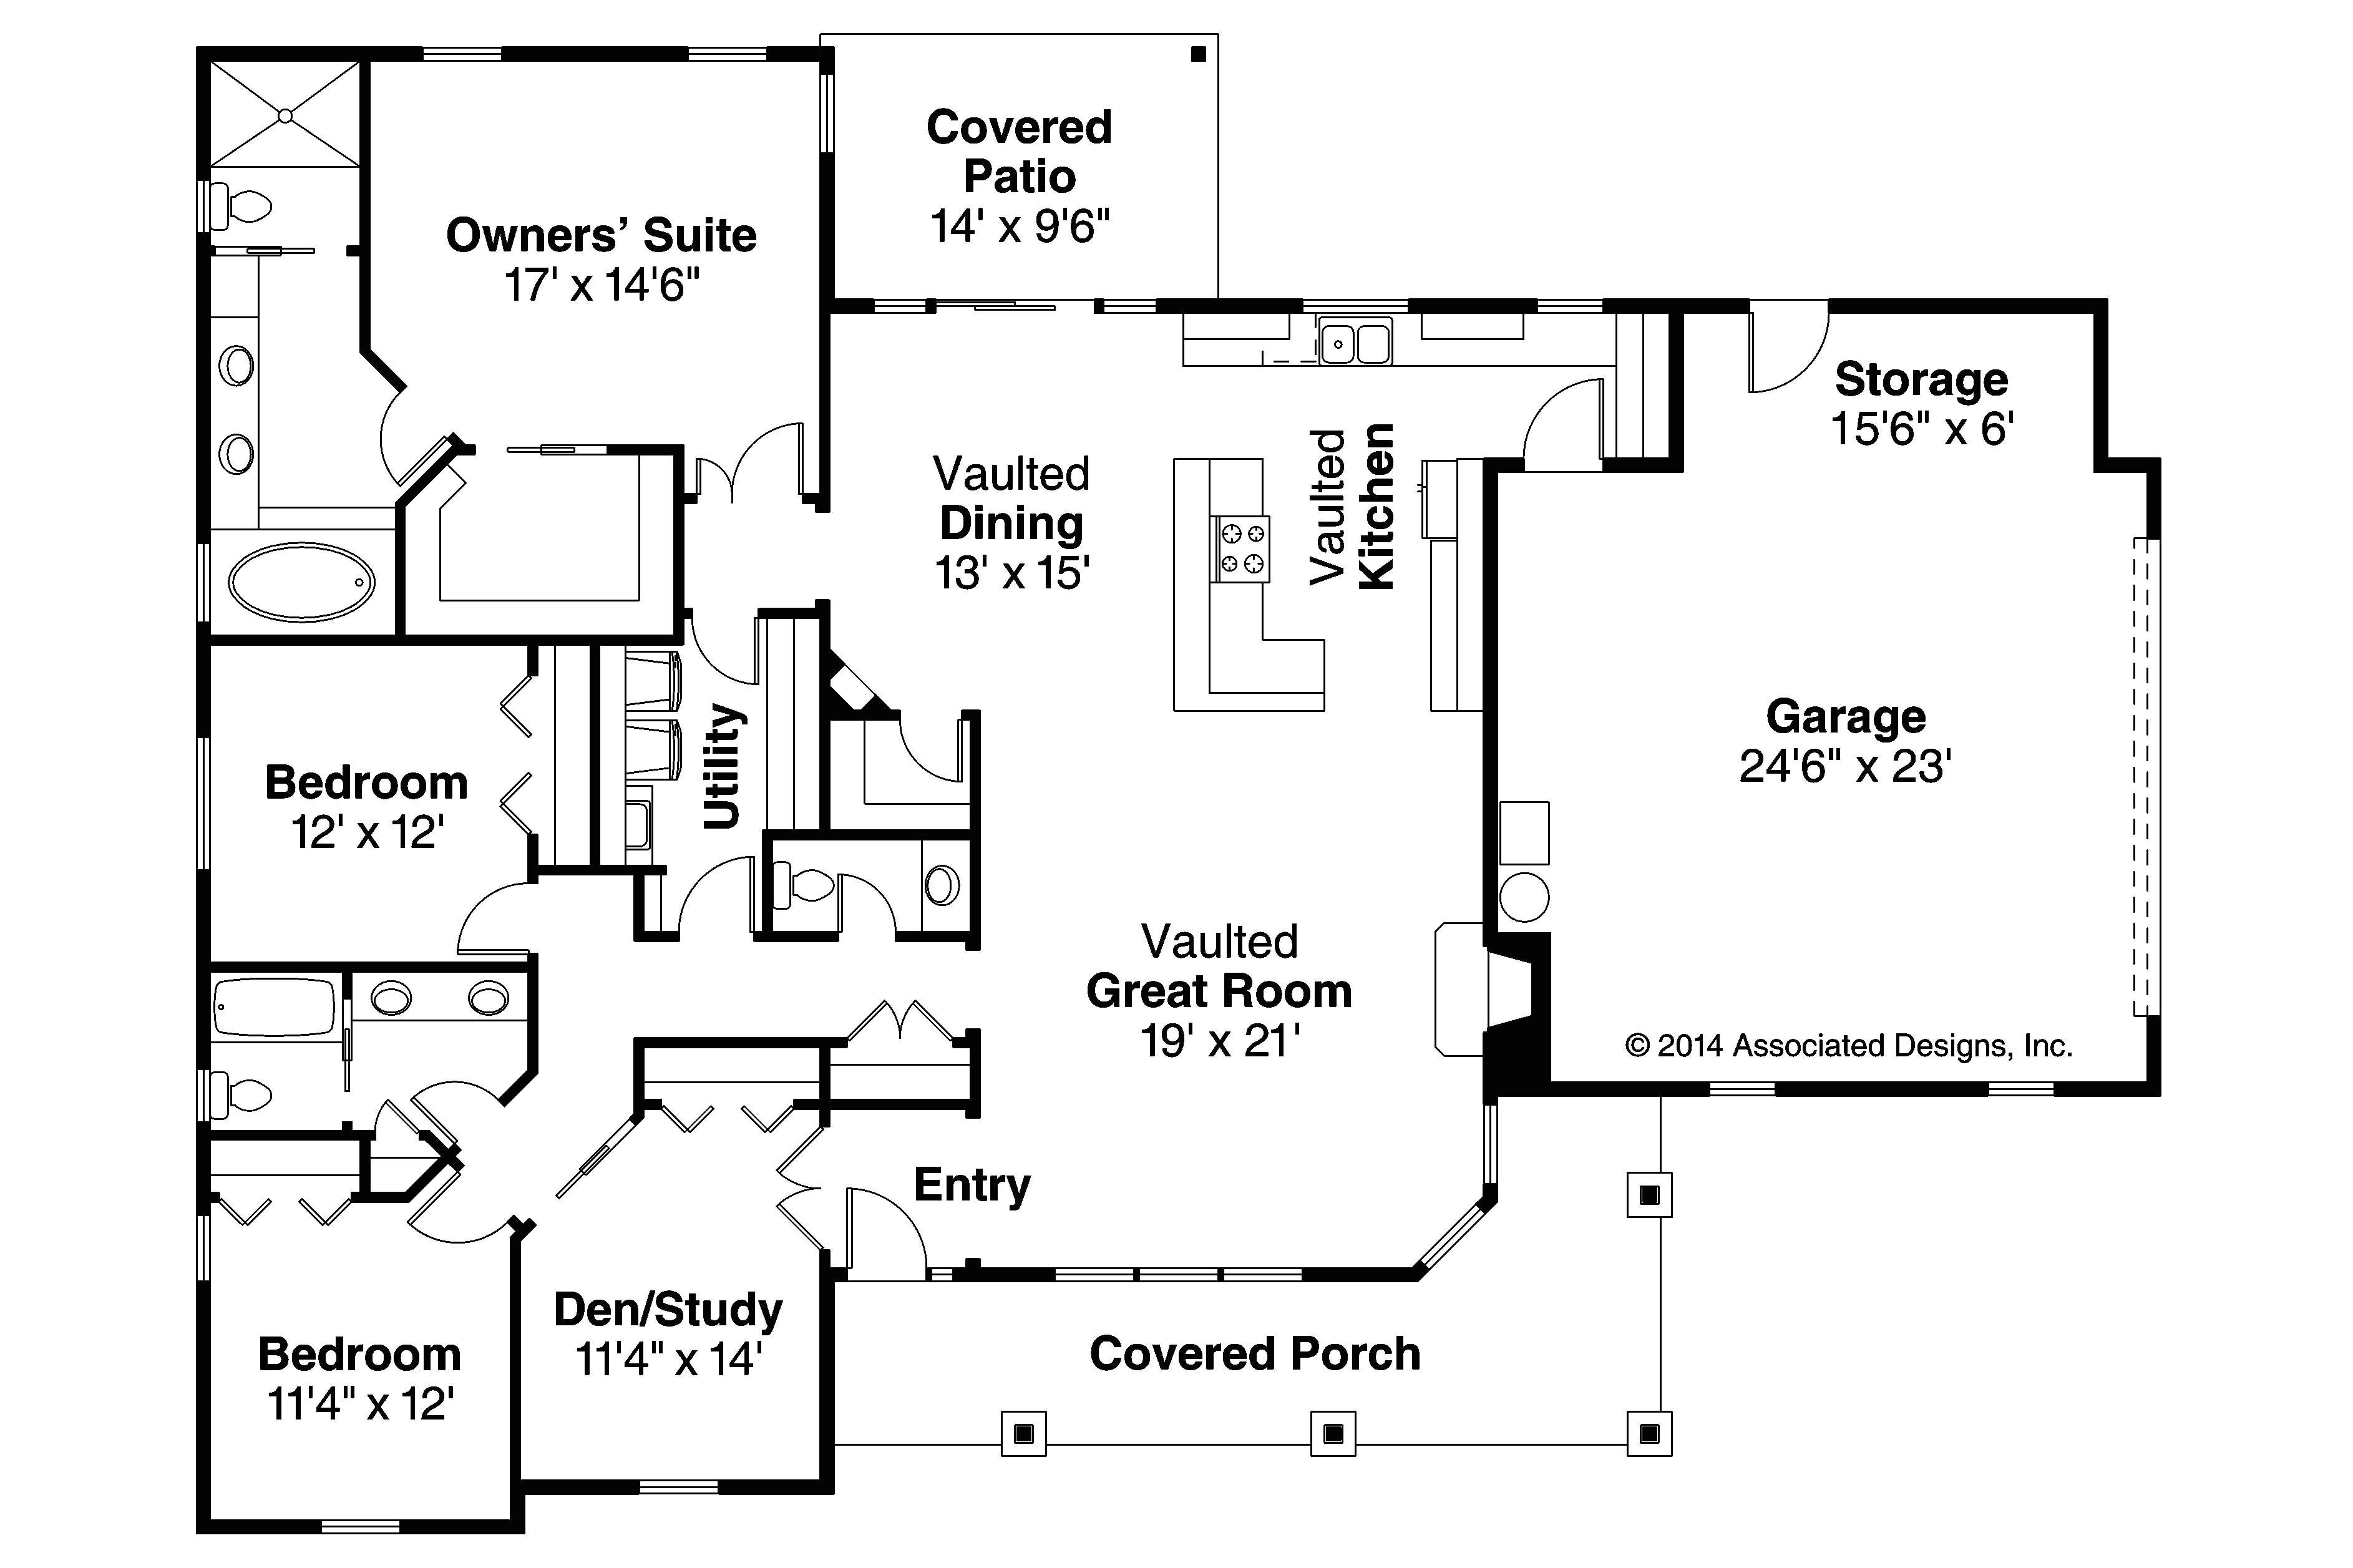 Home Floor Plan Ranch House Plans Brightheart 10 610 associated Designs